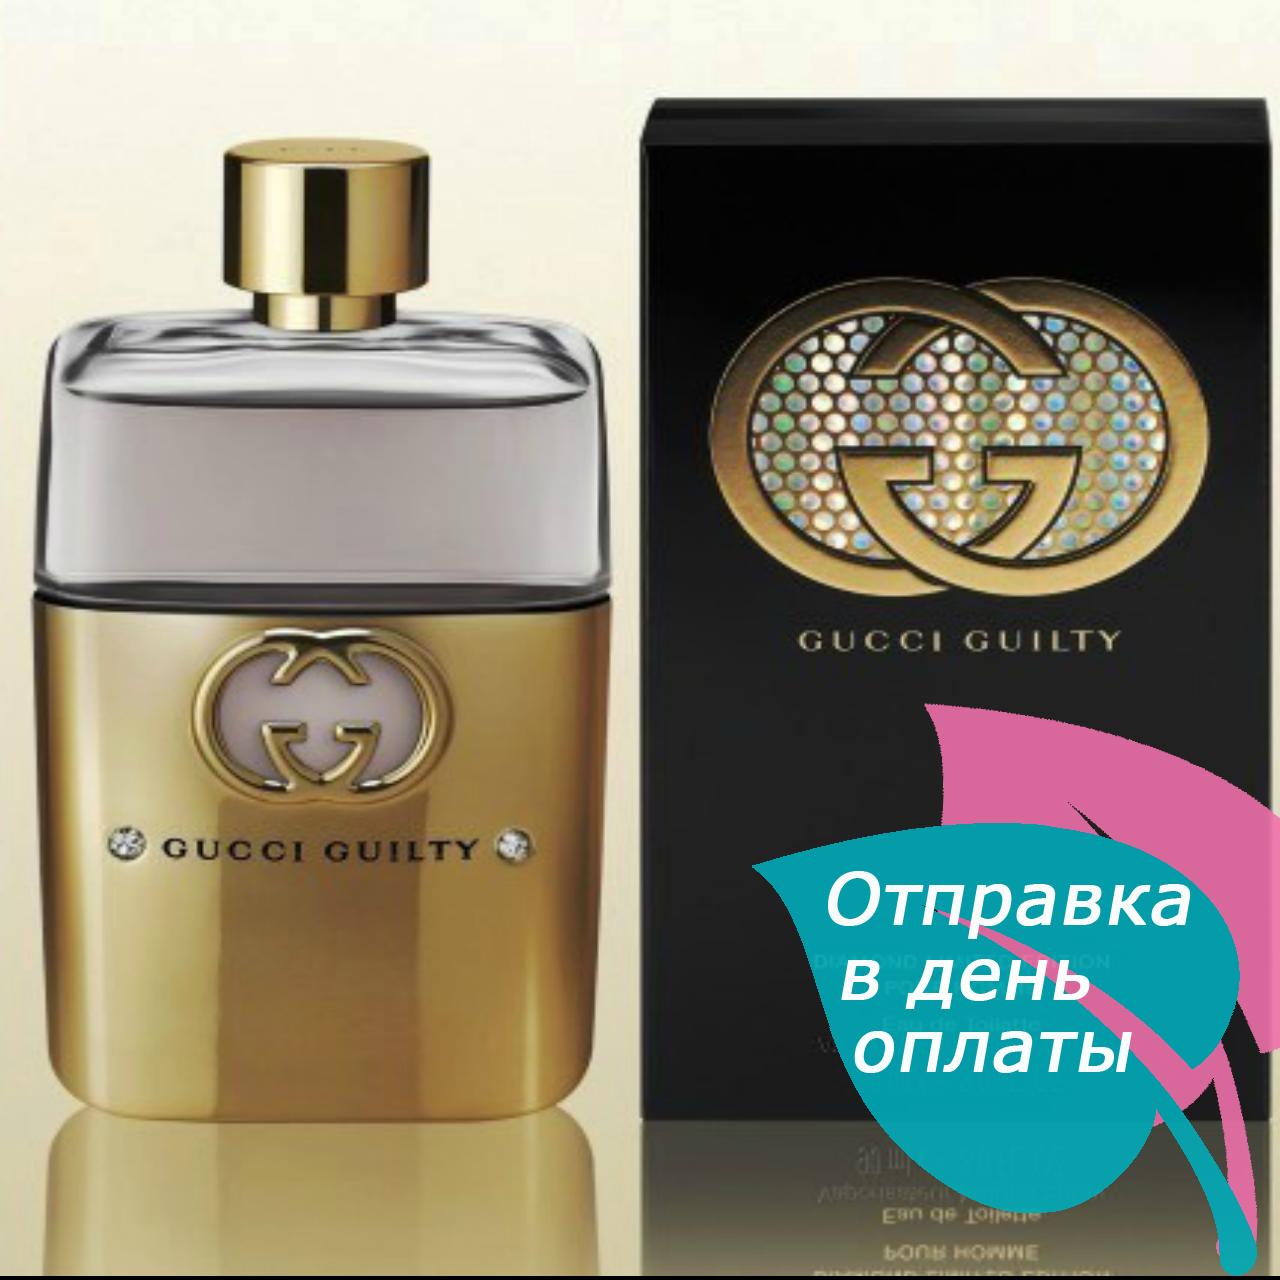 Мужская туалетная вода Gucci Guilty Diamond Limited Edition